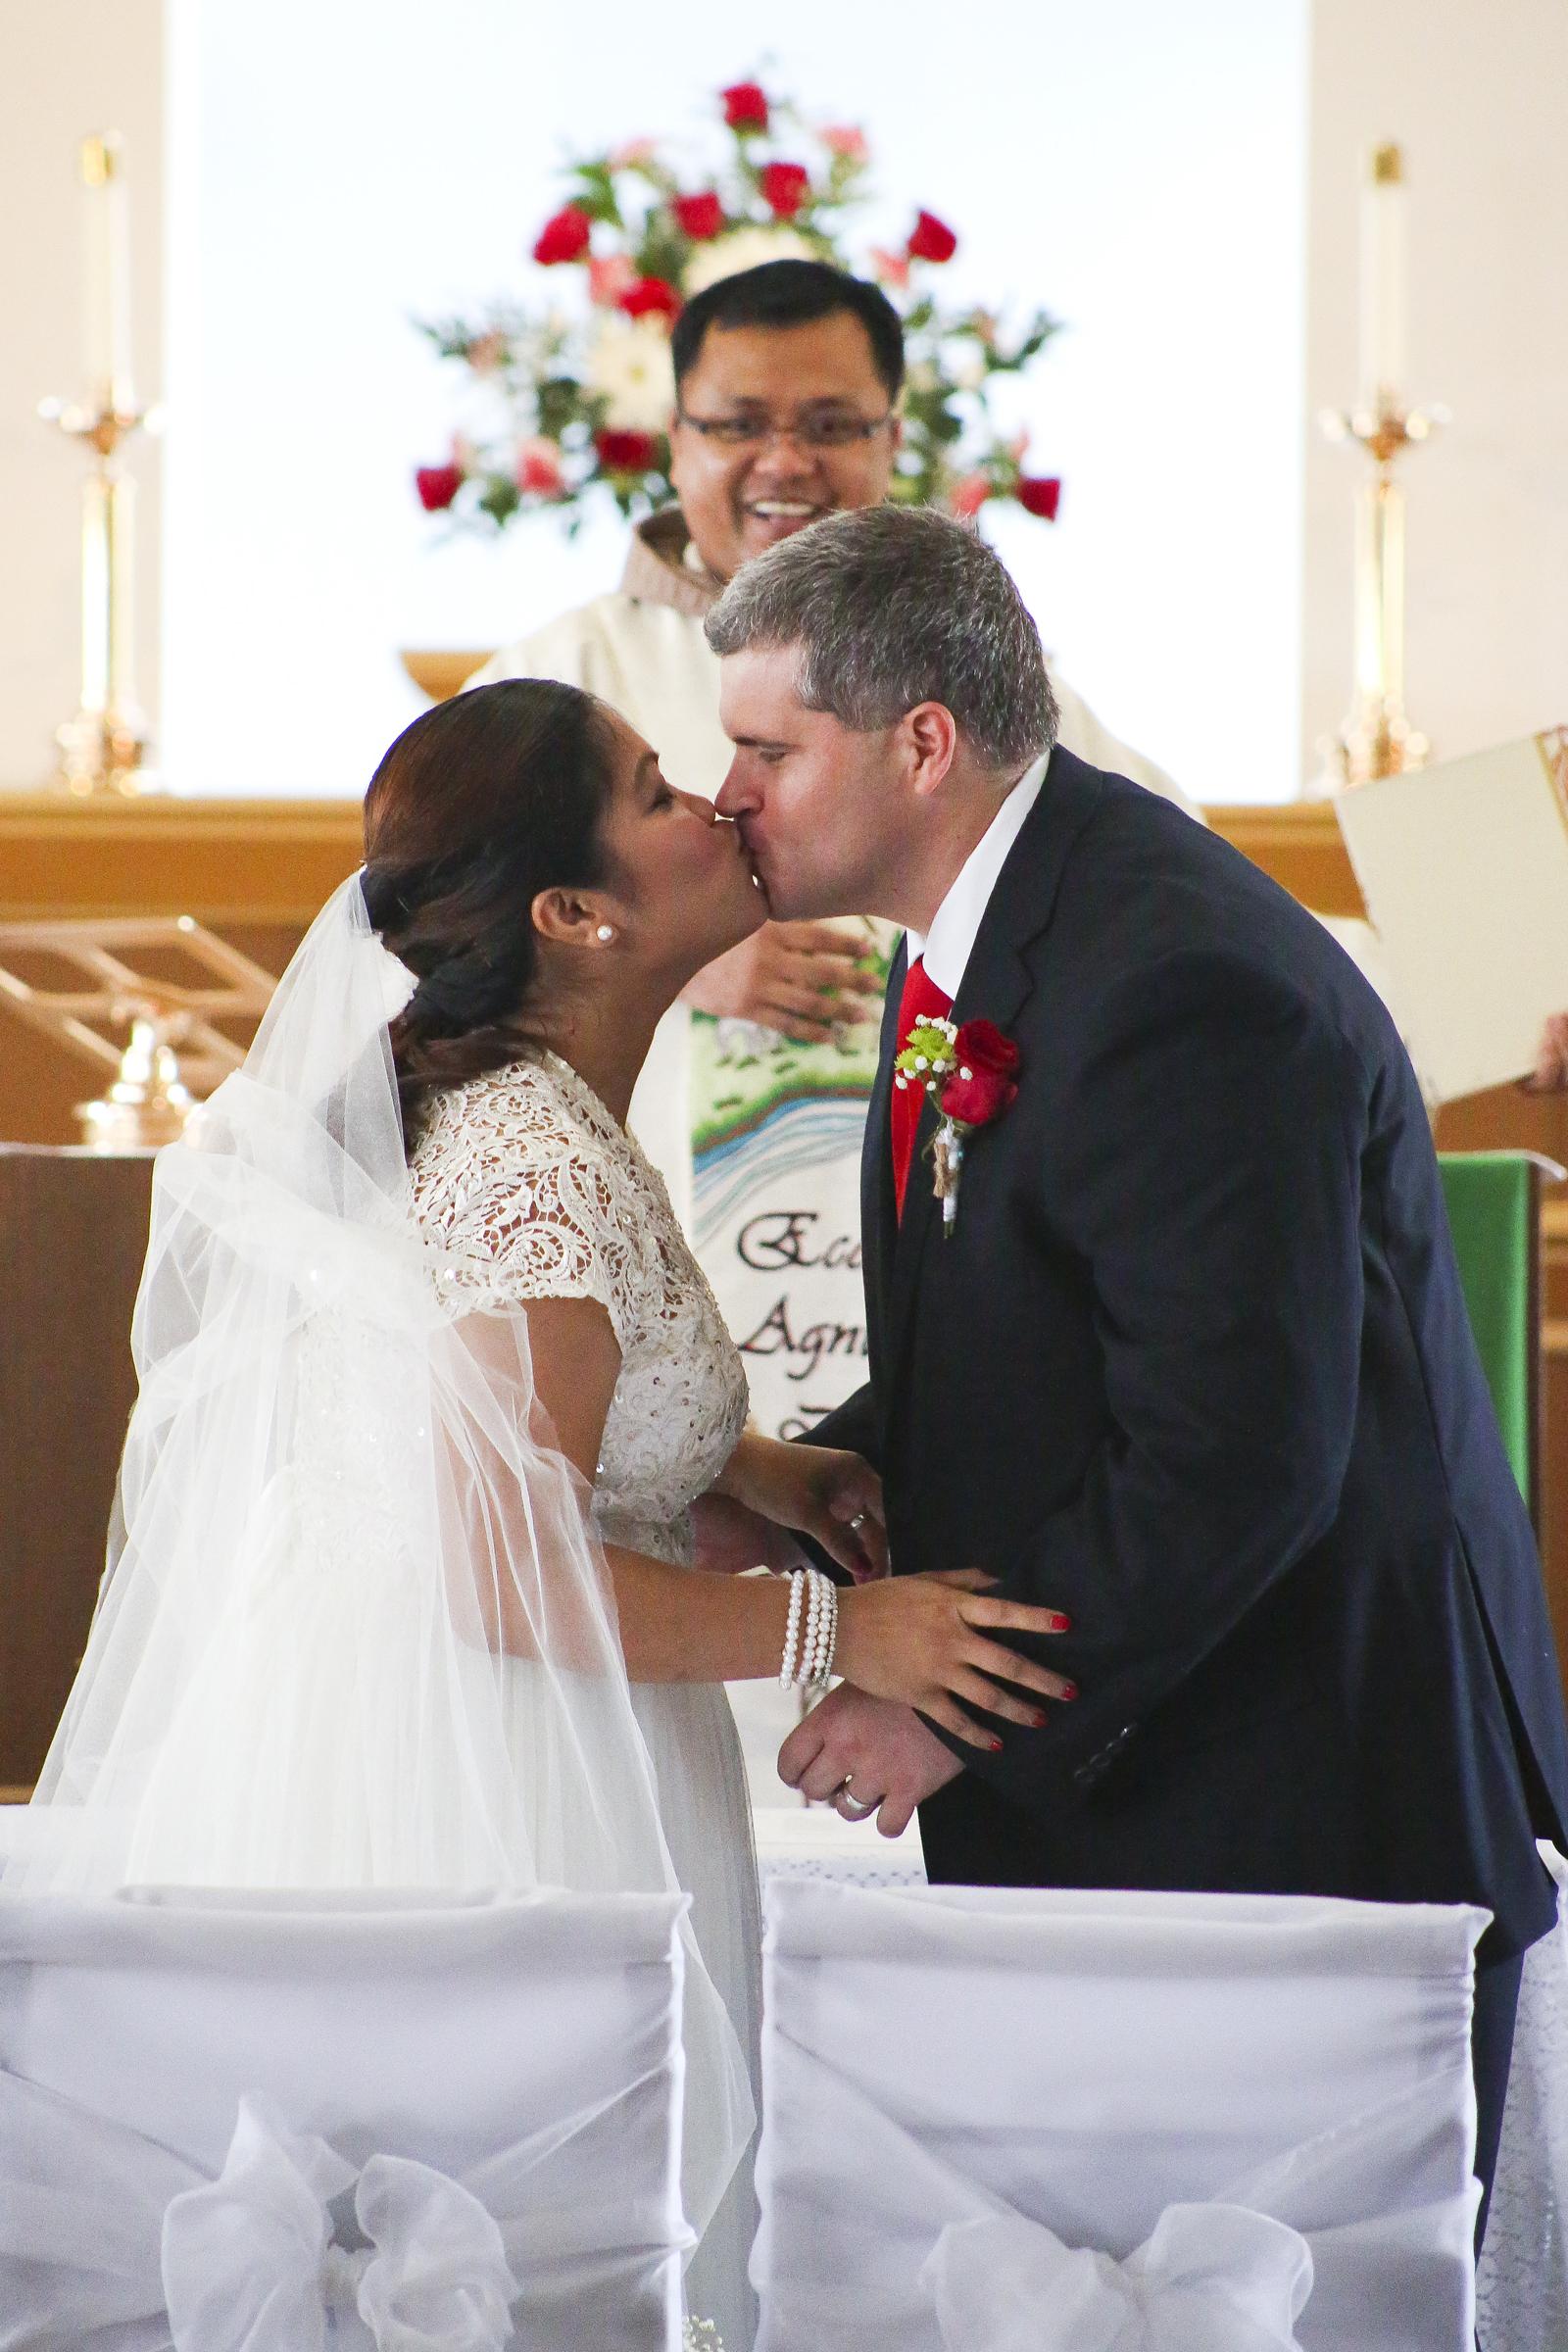 062516_Wedding_Toby-0085.jpg